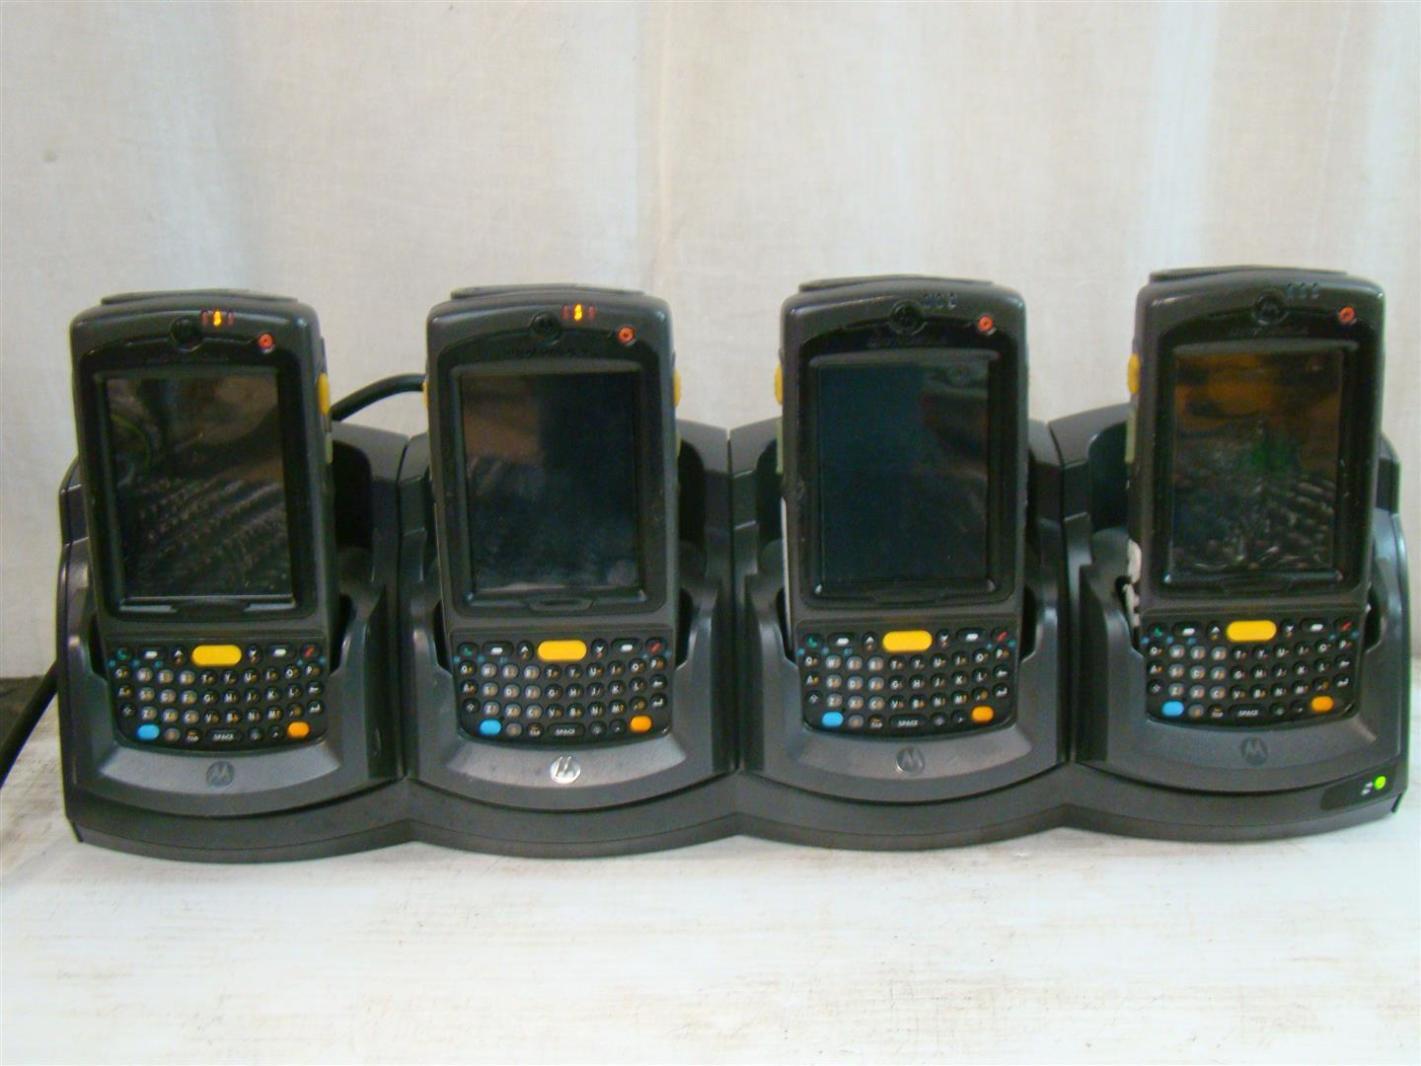 4 Motorola Wireless Handheld Computer Barcode Scanner